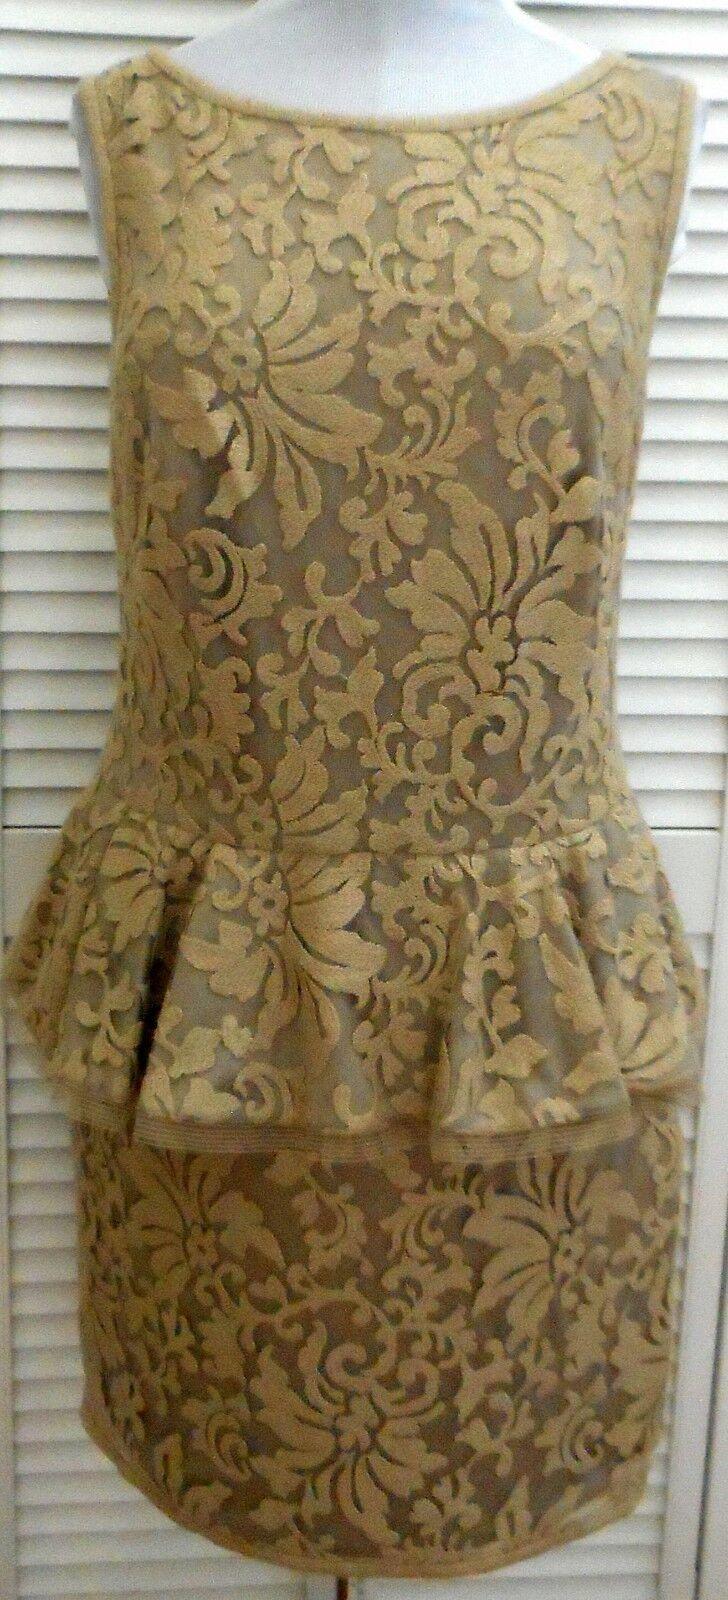 TADASHI SHOJI Dress size 14 Large Tan EMBROIDERED Peplum Sleeveless Women's